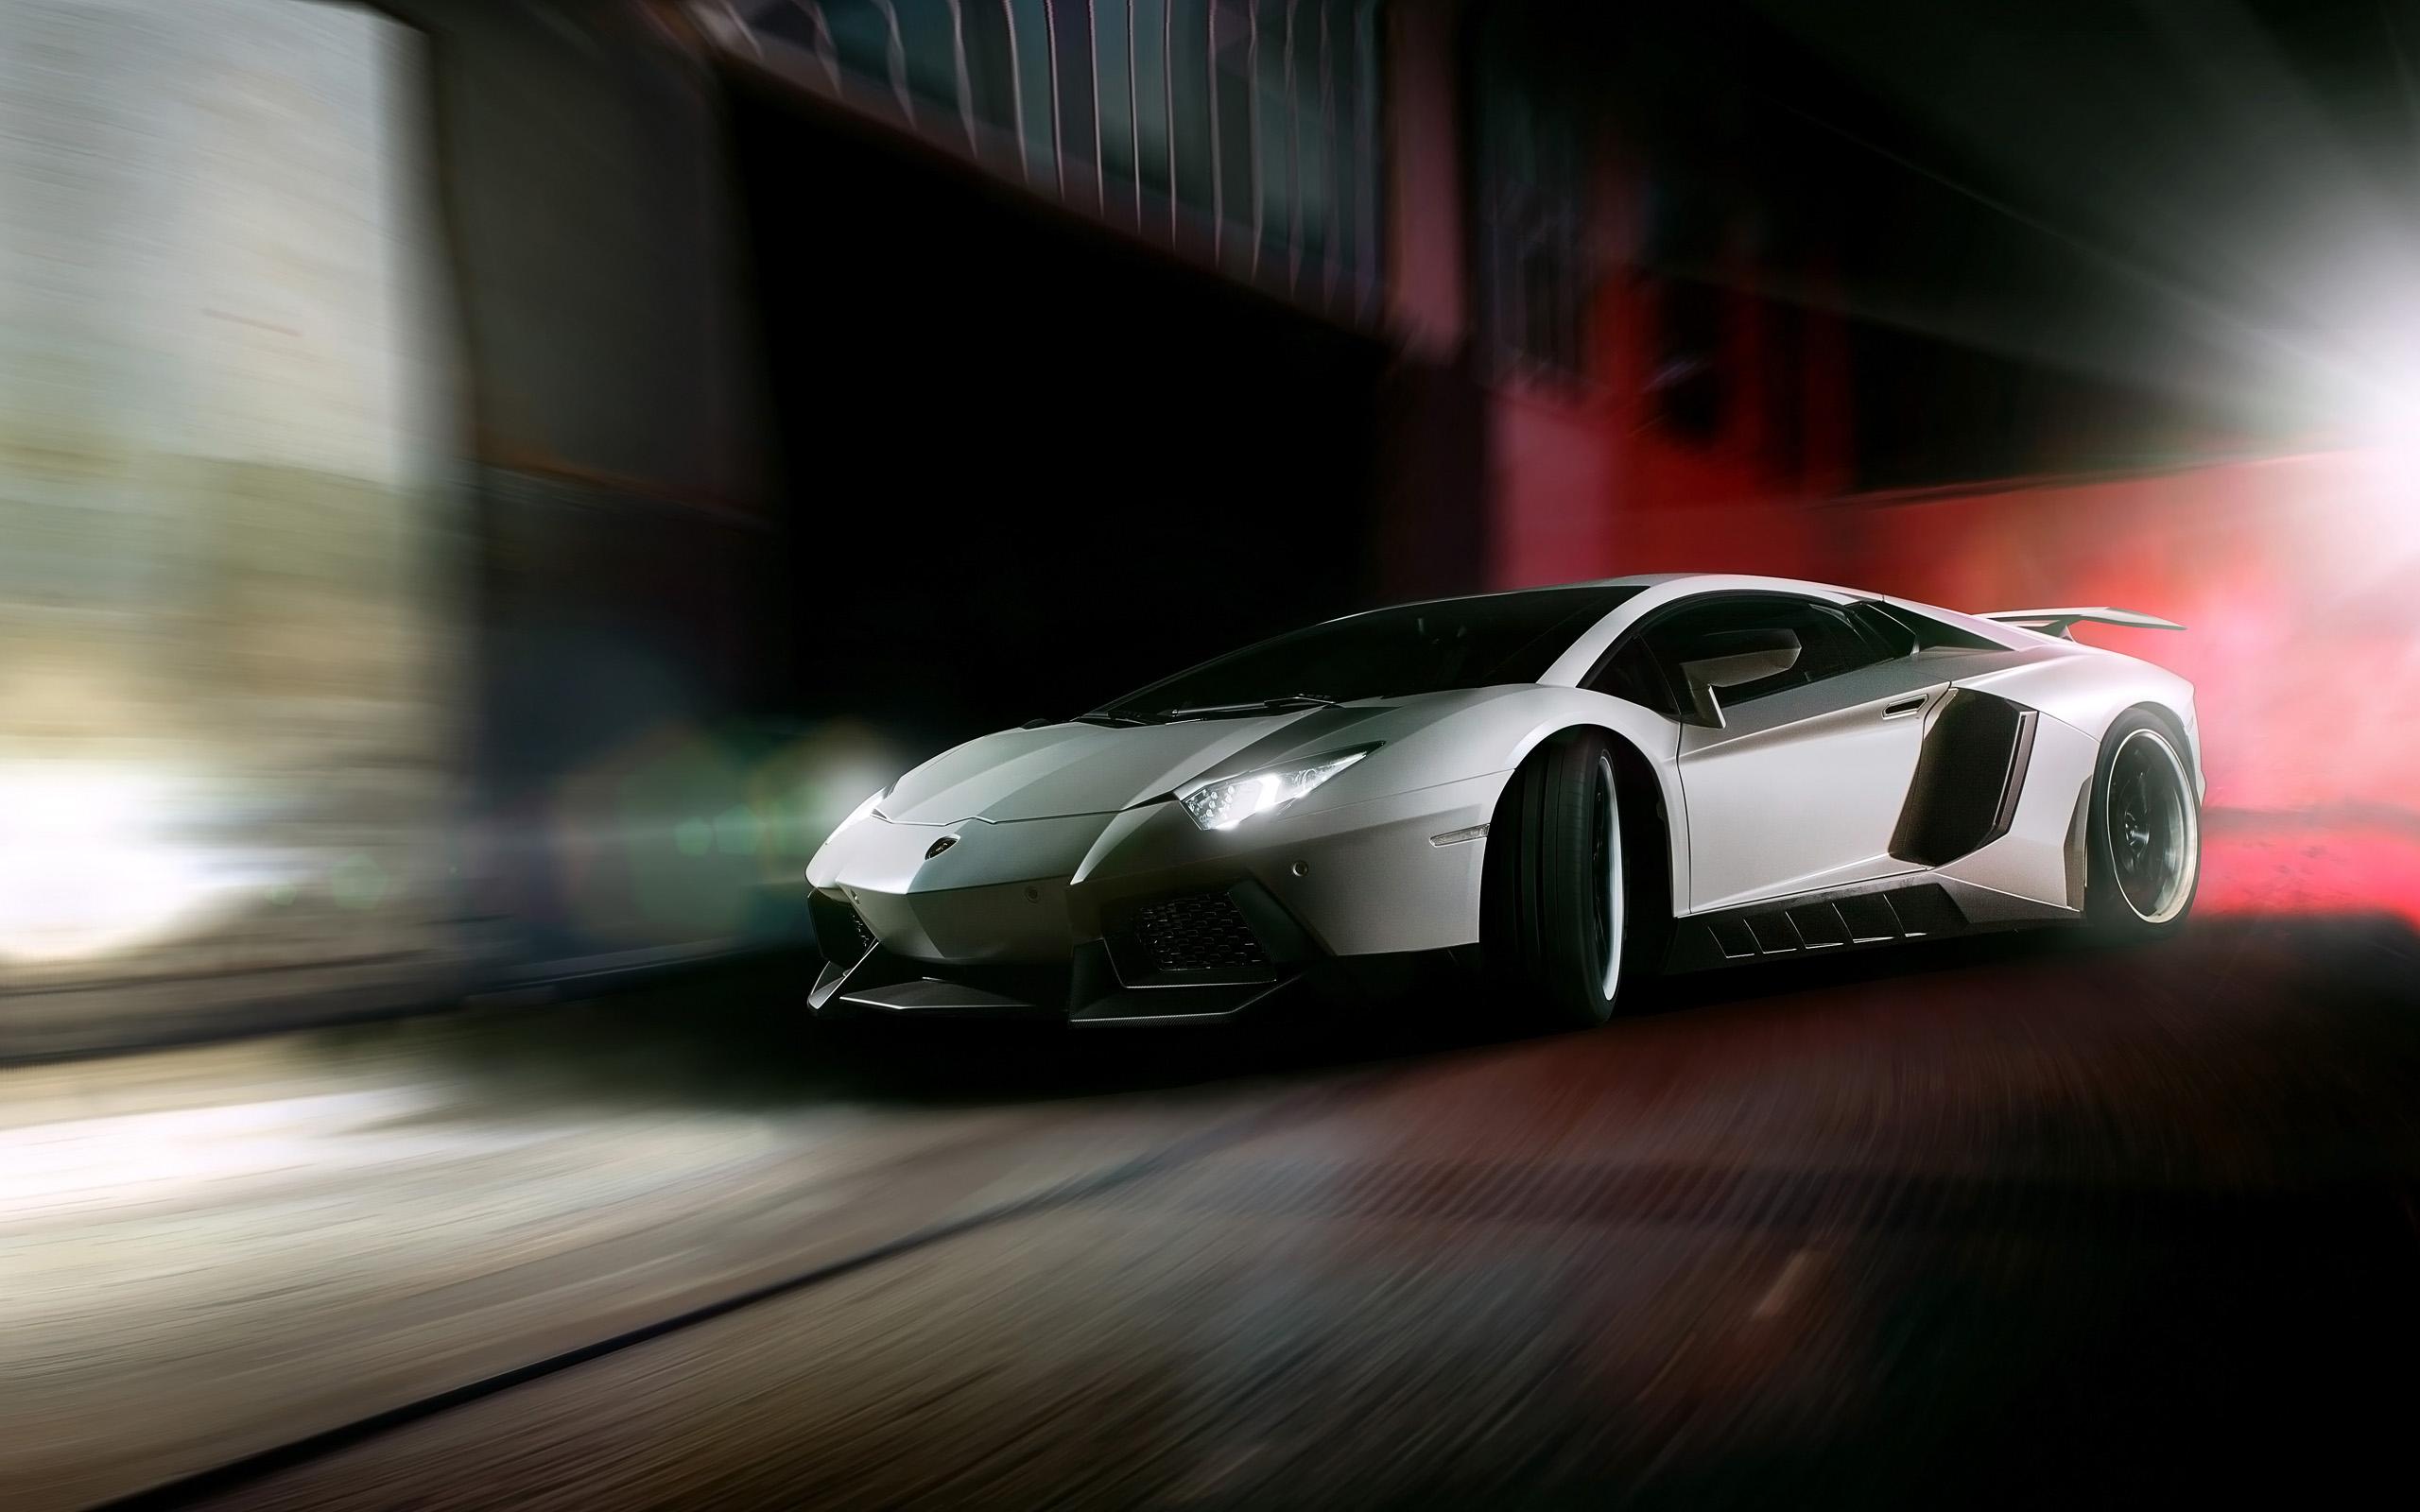 Lamborghini Novitec Torado Wallpapers and Background Images 2560x1600